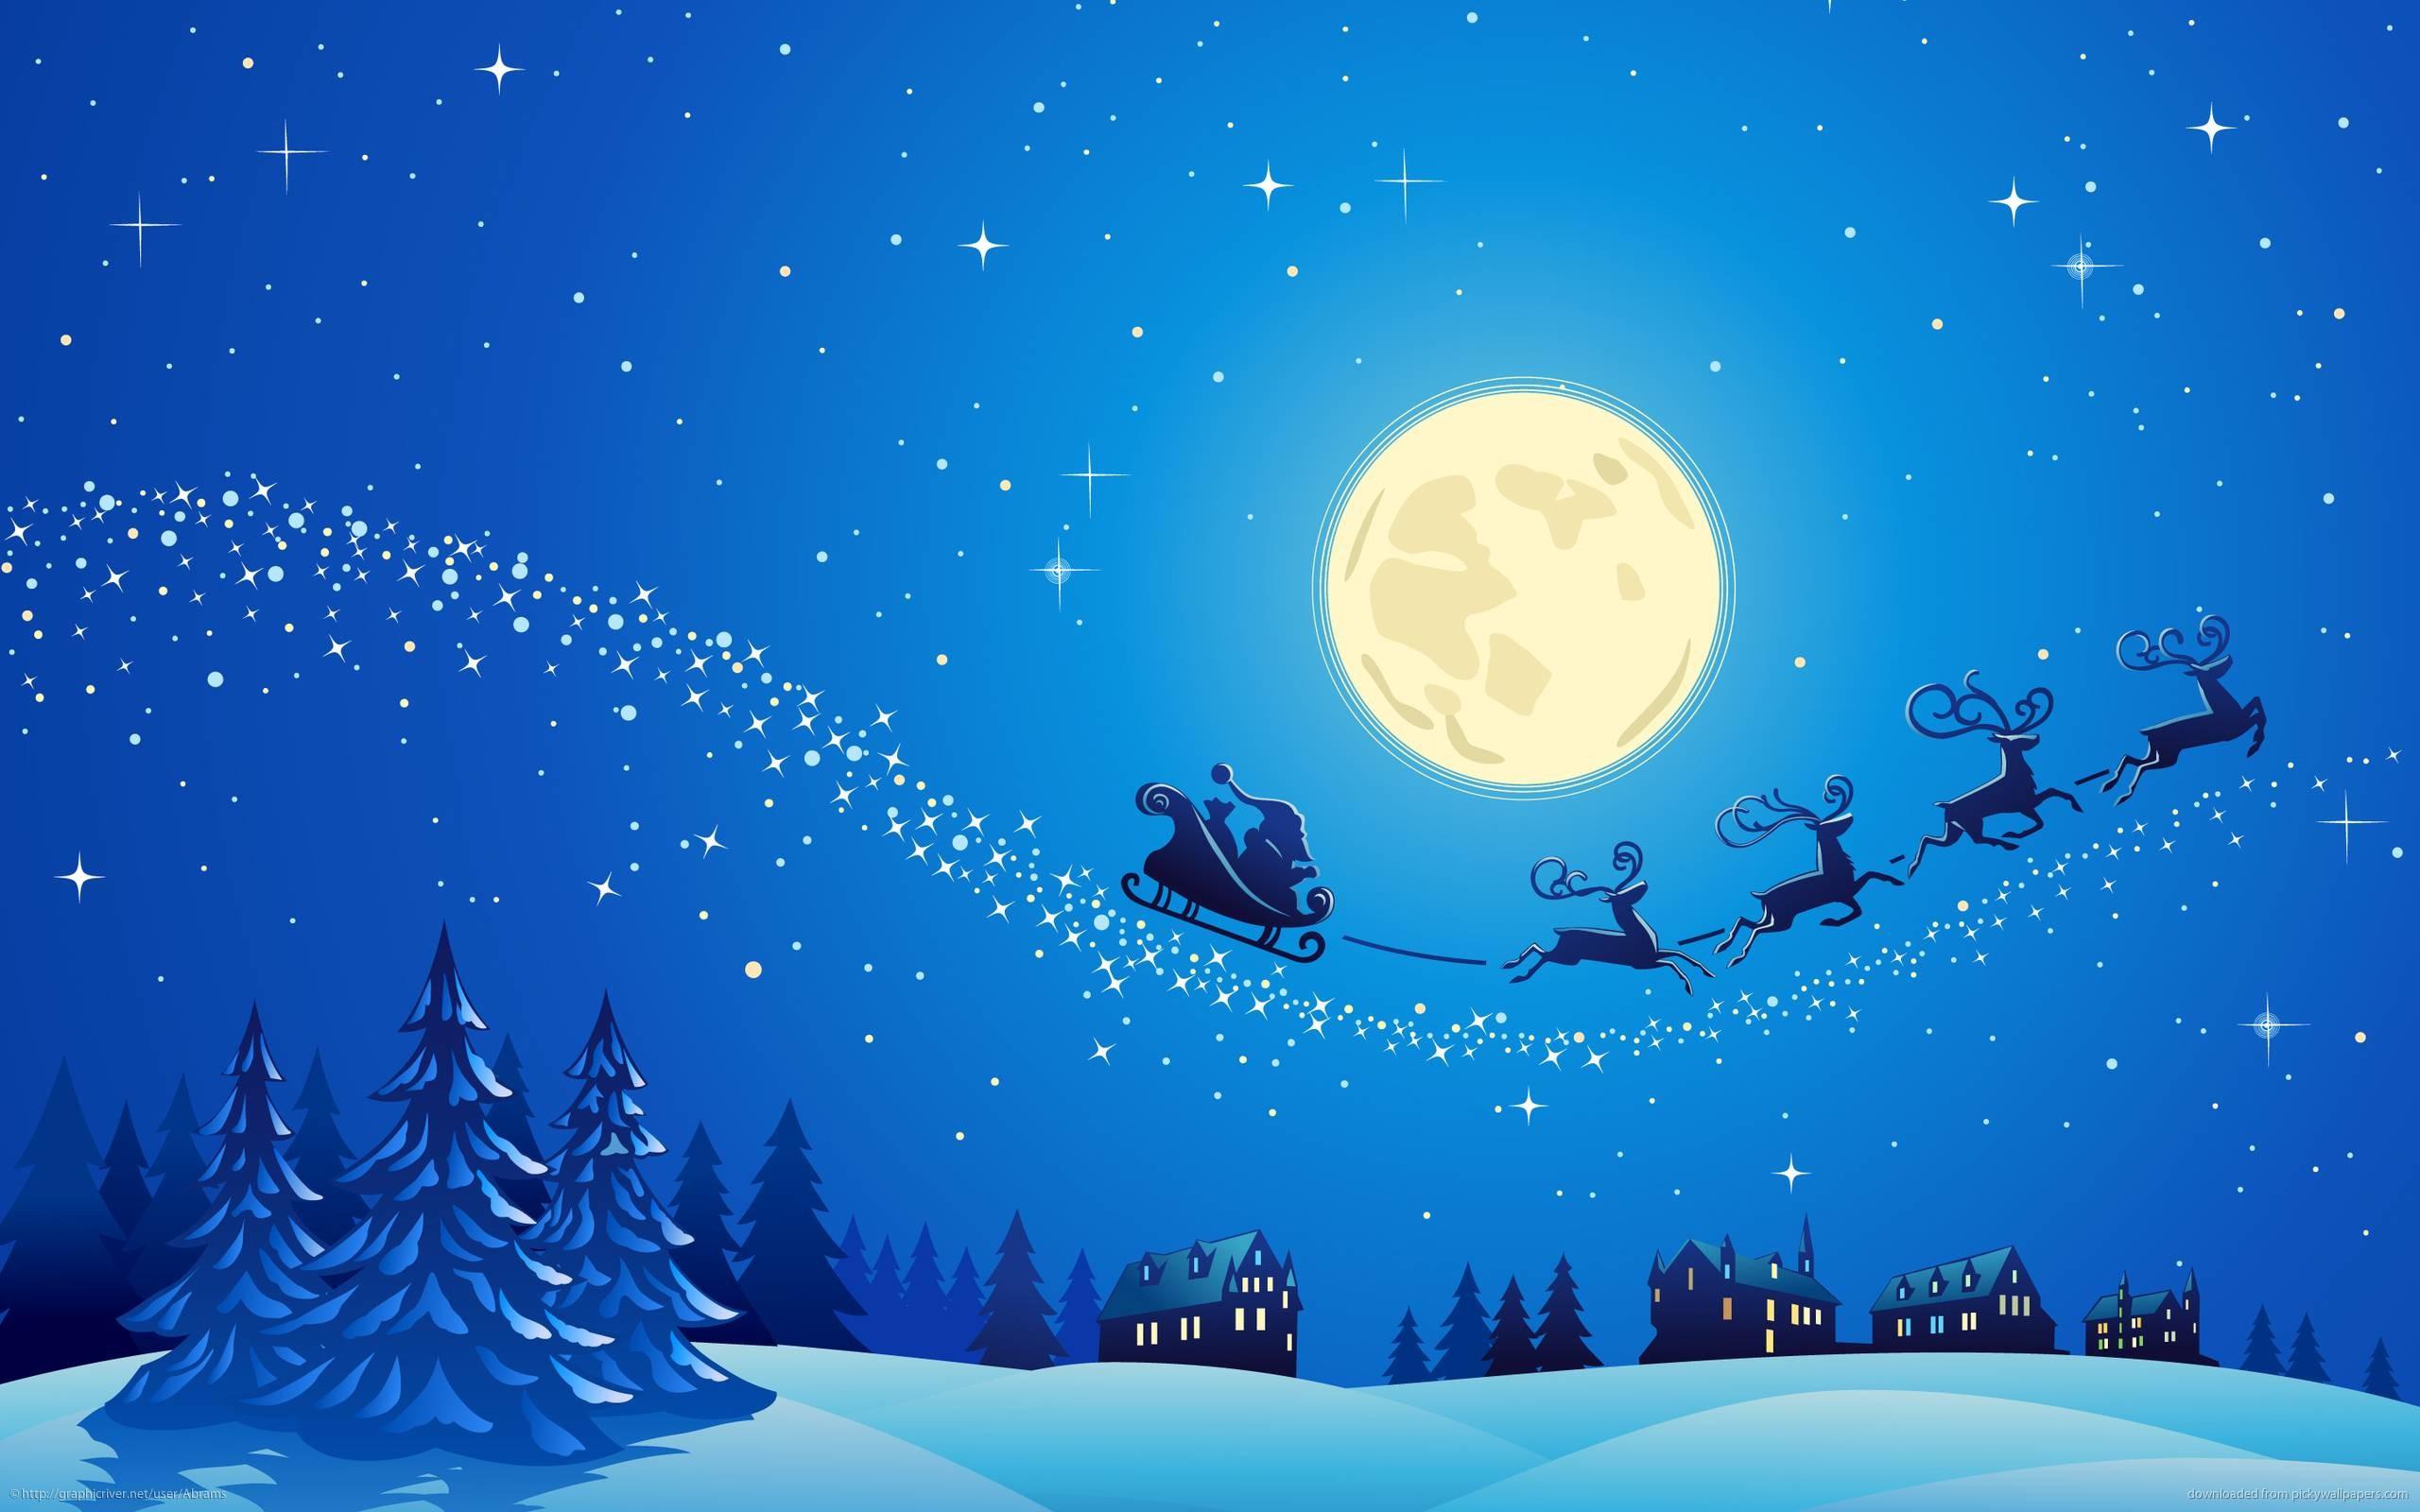 Christmas Hd Wallpaper.Christmas Night Wallpaper Wallpapertag